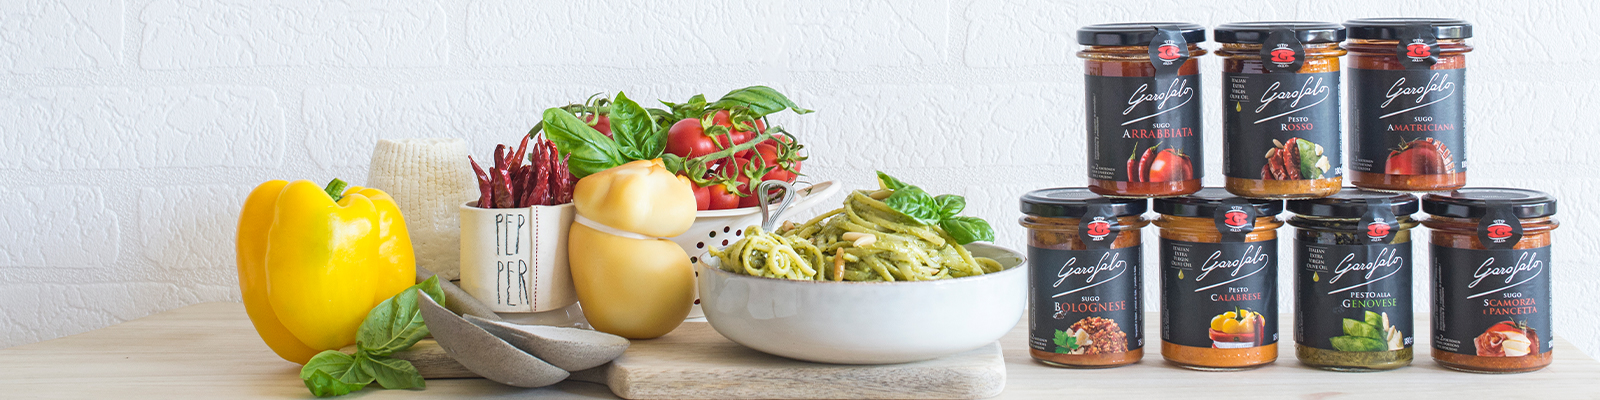 Pasta Garofalo - 310 g Sauces